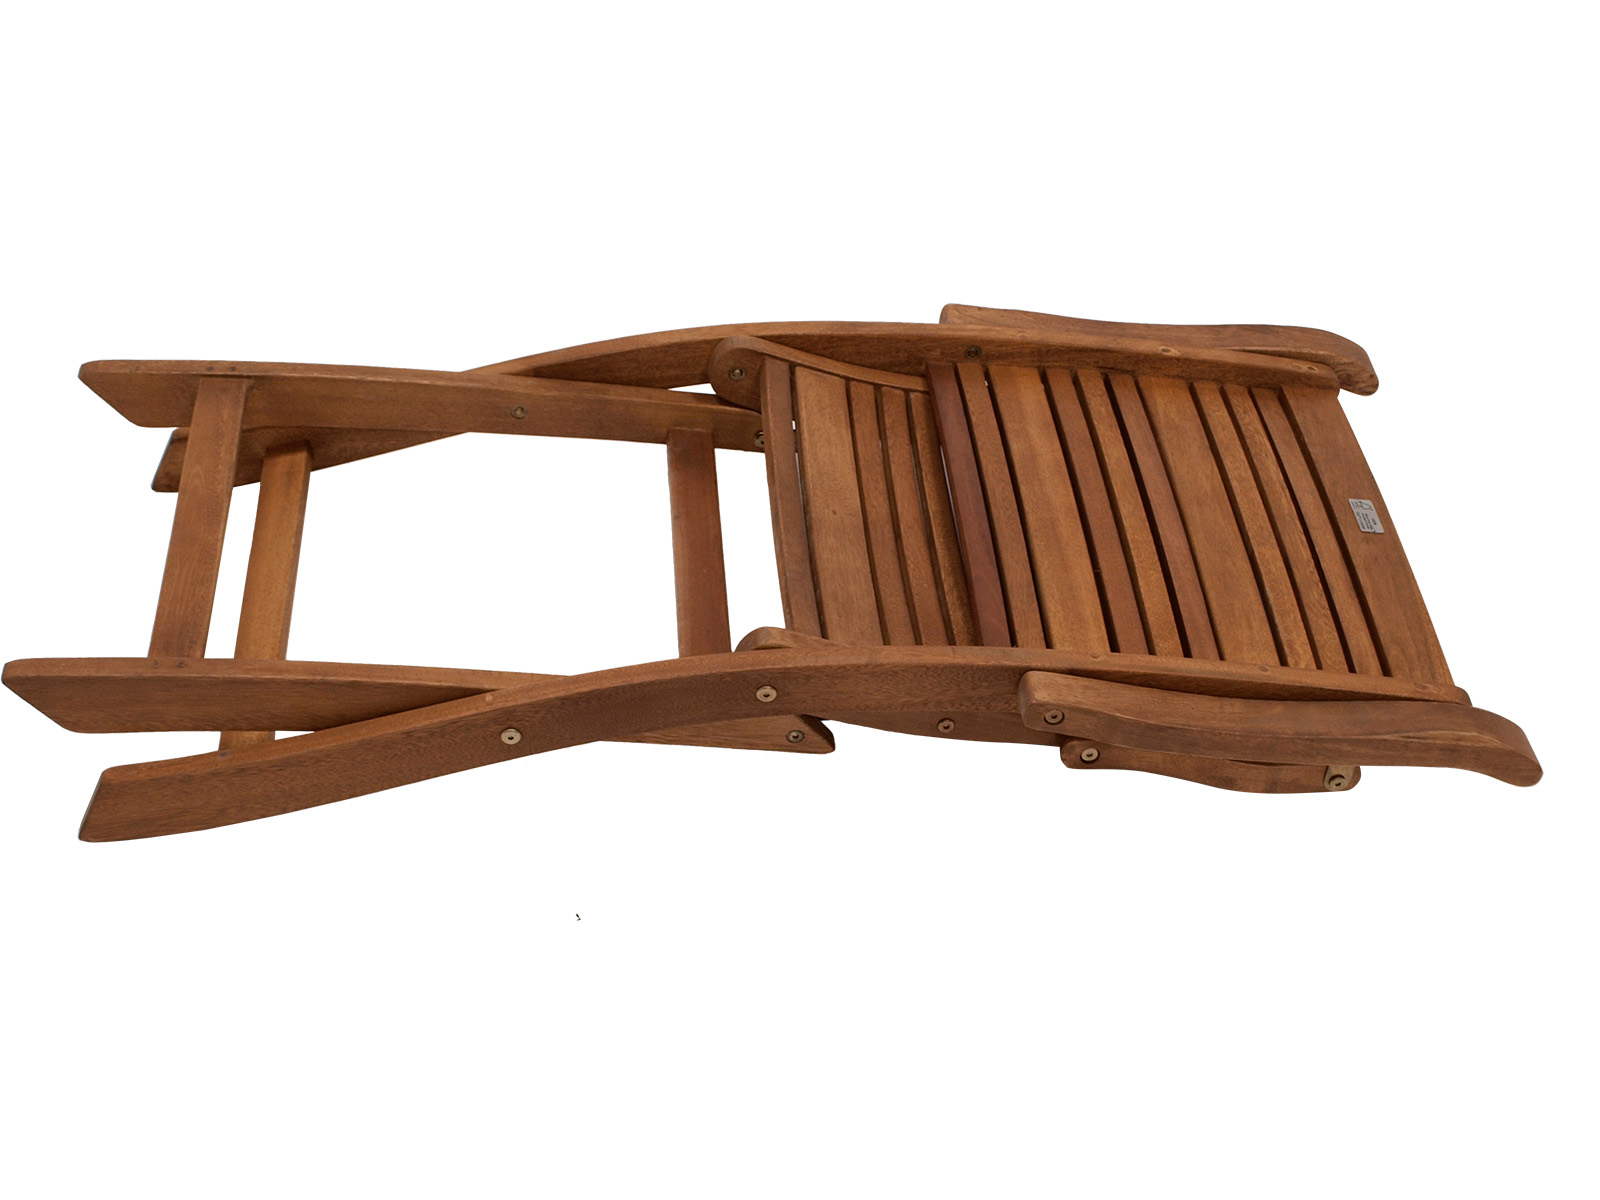 gartenstuhl klappstuhl holzstuhl gartenm bel stuhl filey mit armlehnen 2 st ck ebay. Black Bedroom Furniture Sets. Home Design Ideas